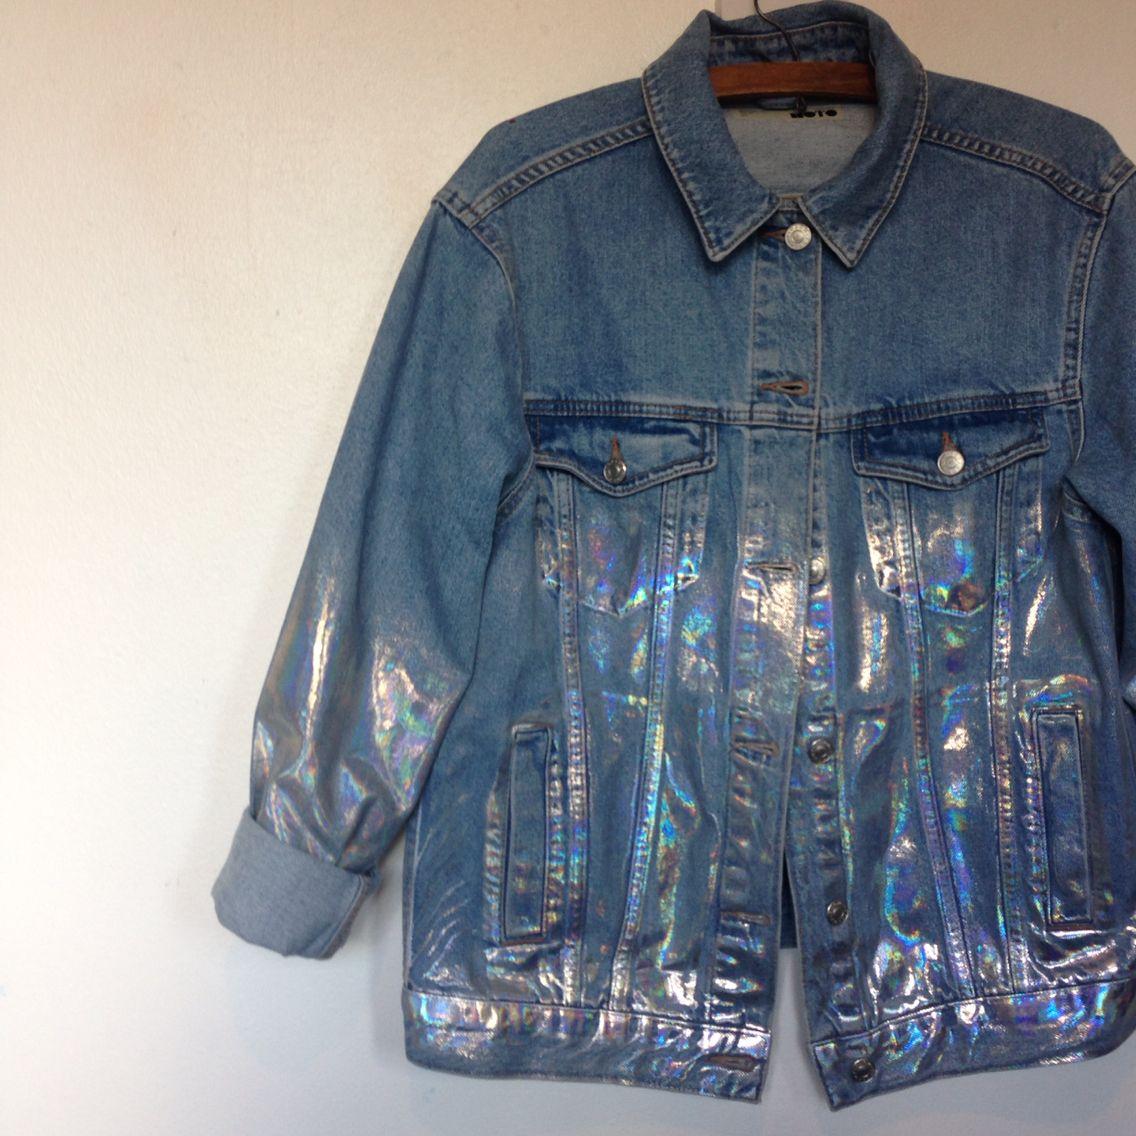 4afbbb5c9e8b4 Topshop holographic denim jacket